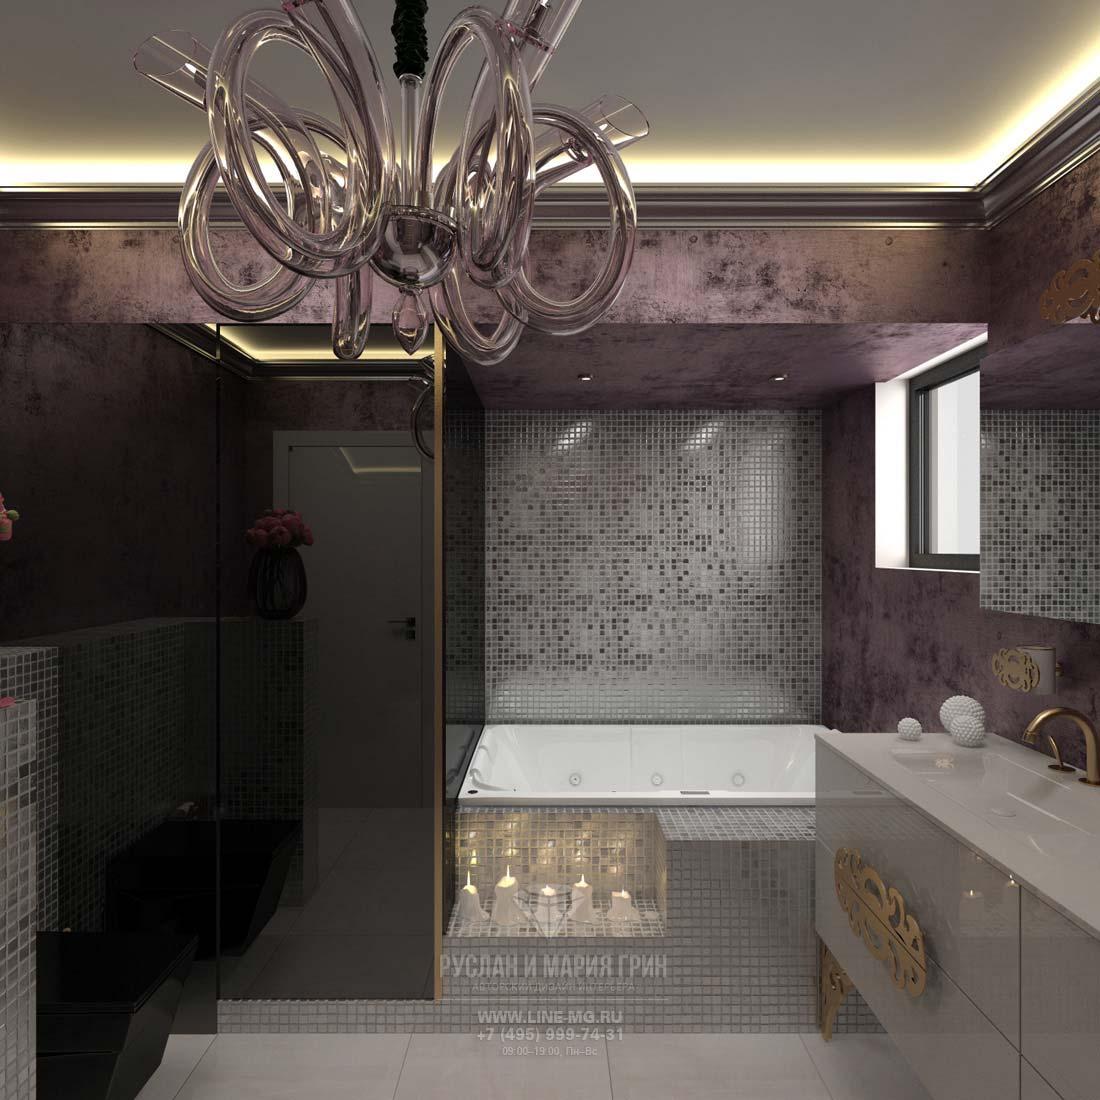 Bathroom interior in the cottage